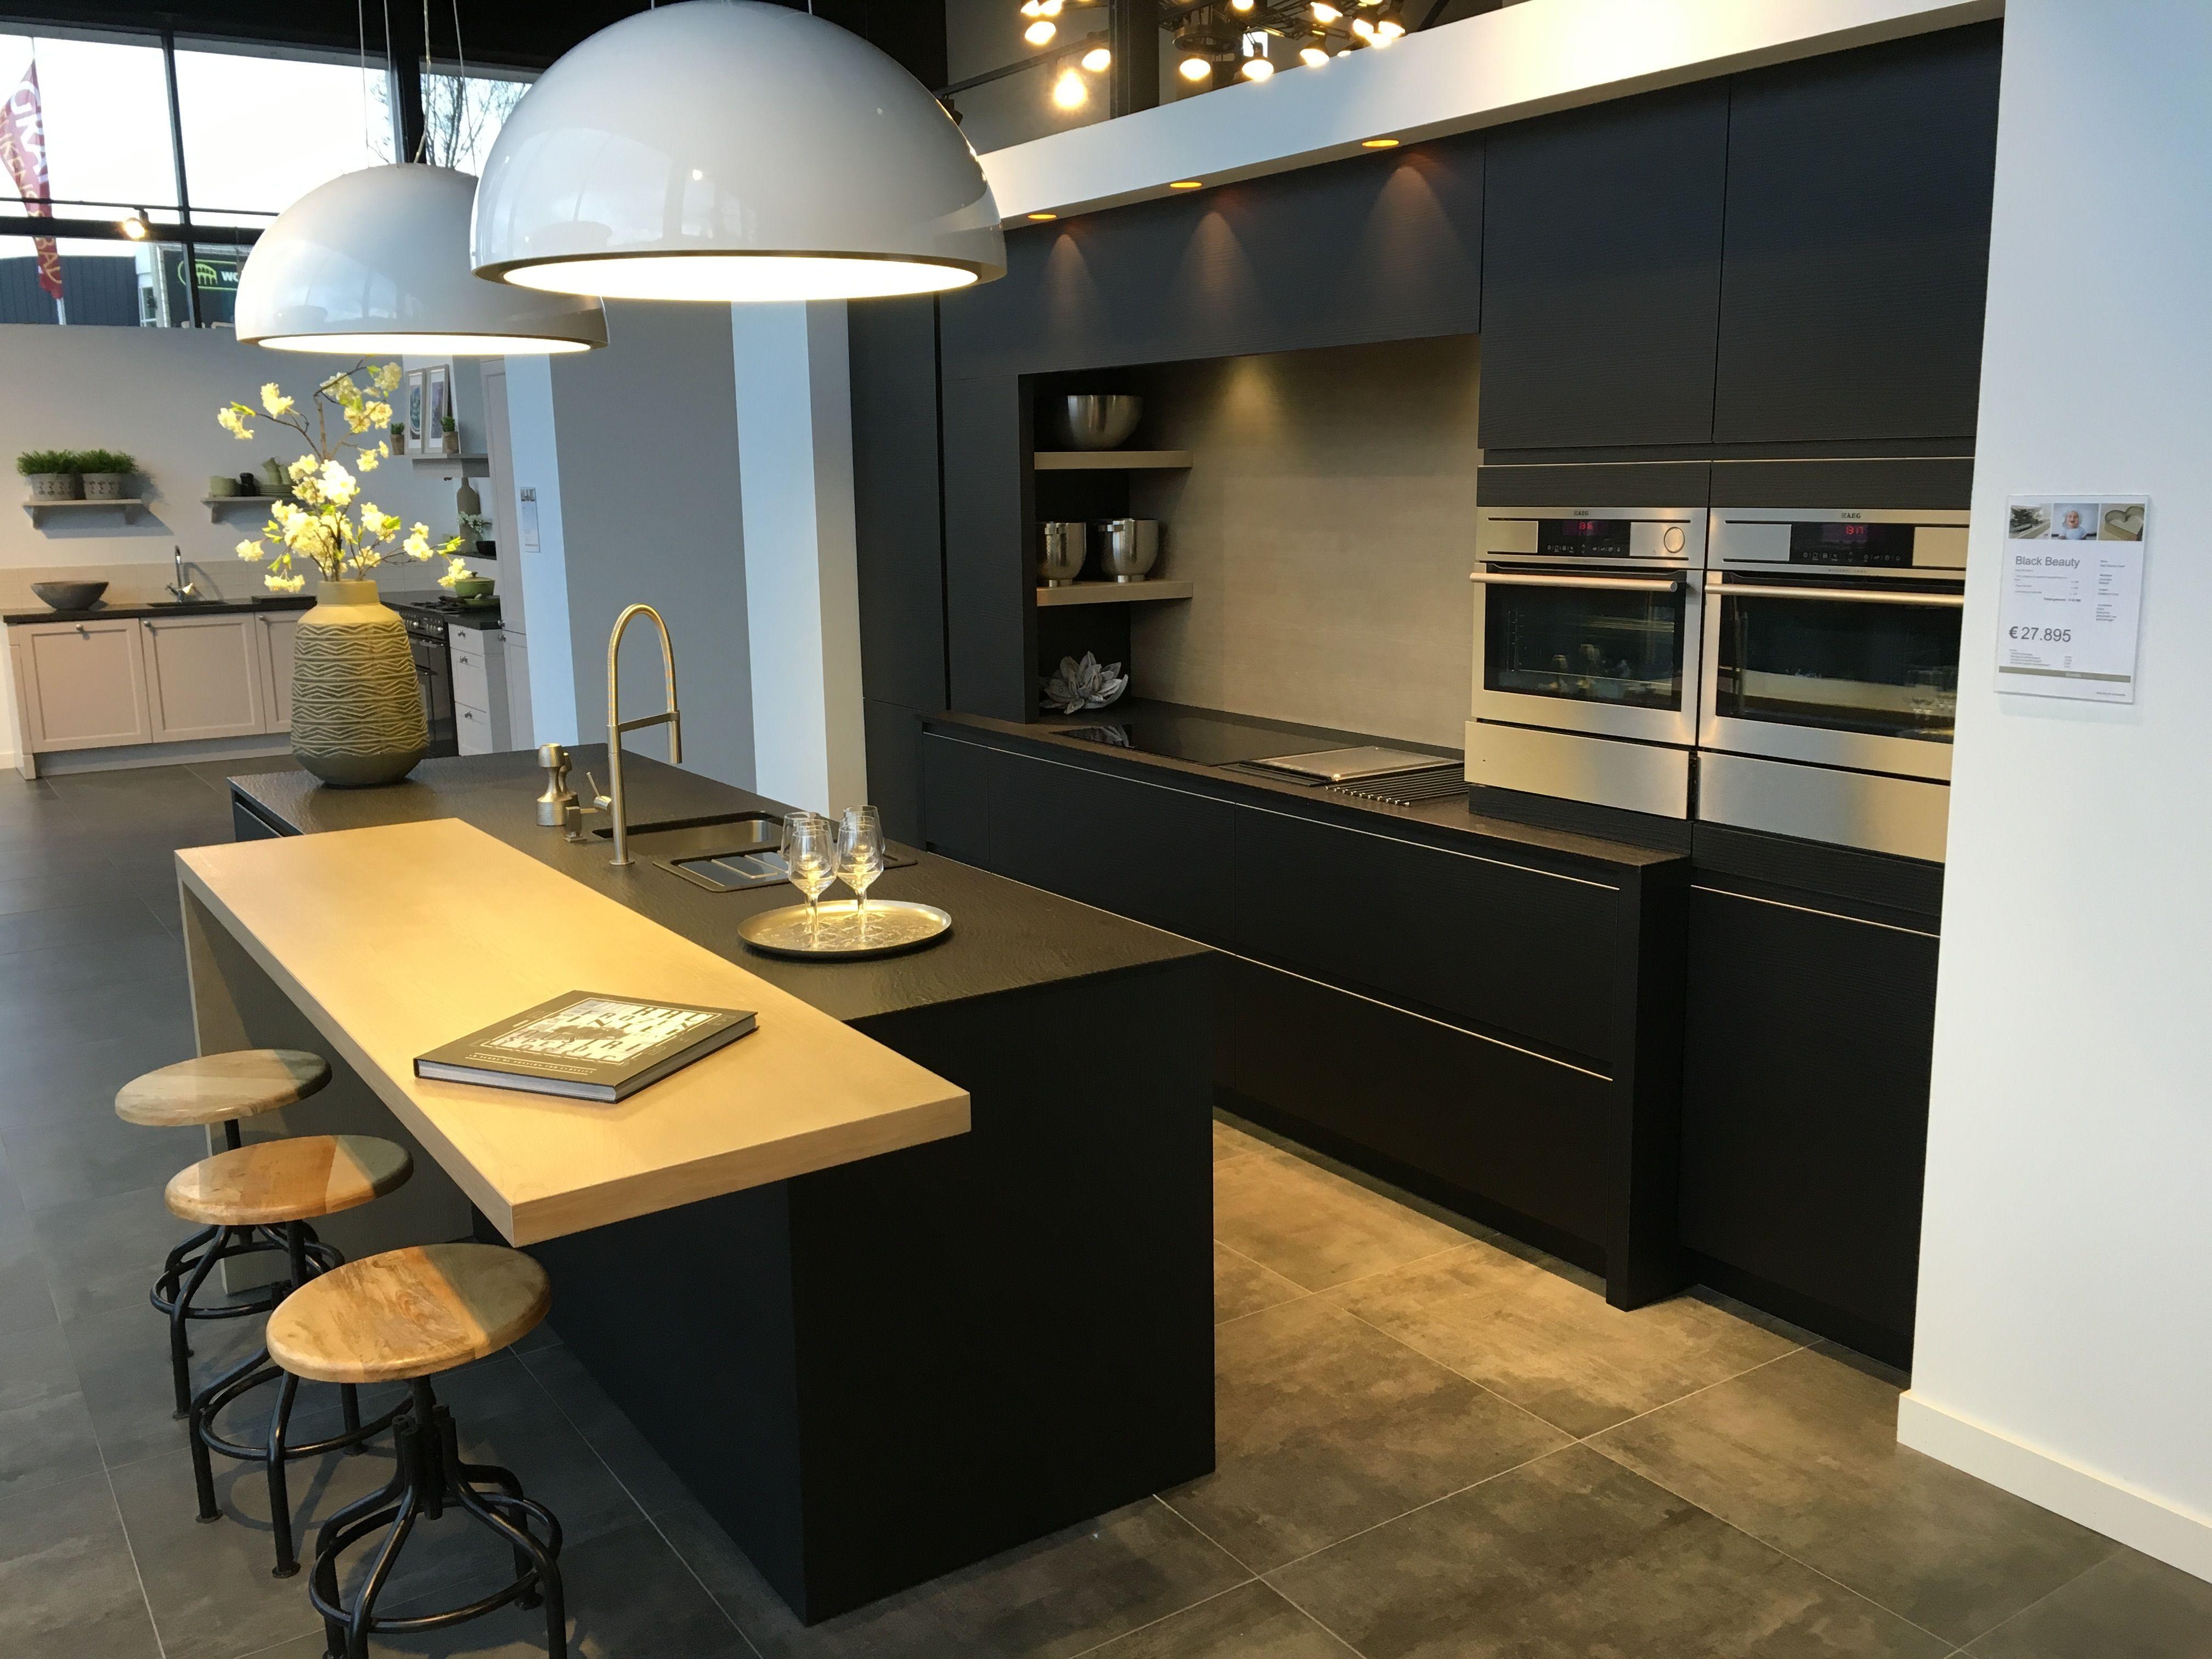 Grando Keukens Amsterdam : Showroomkeukens son black beauty 15 grando keukens & bad